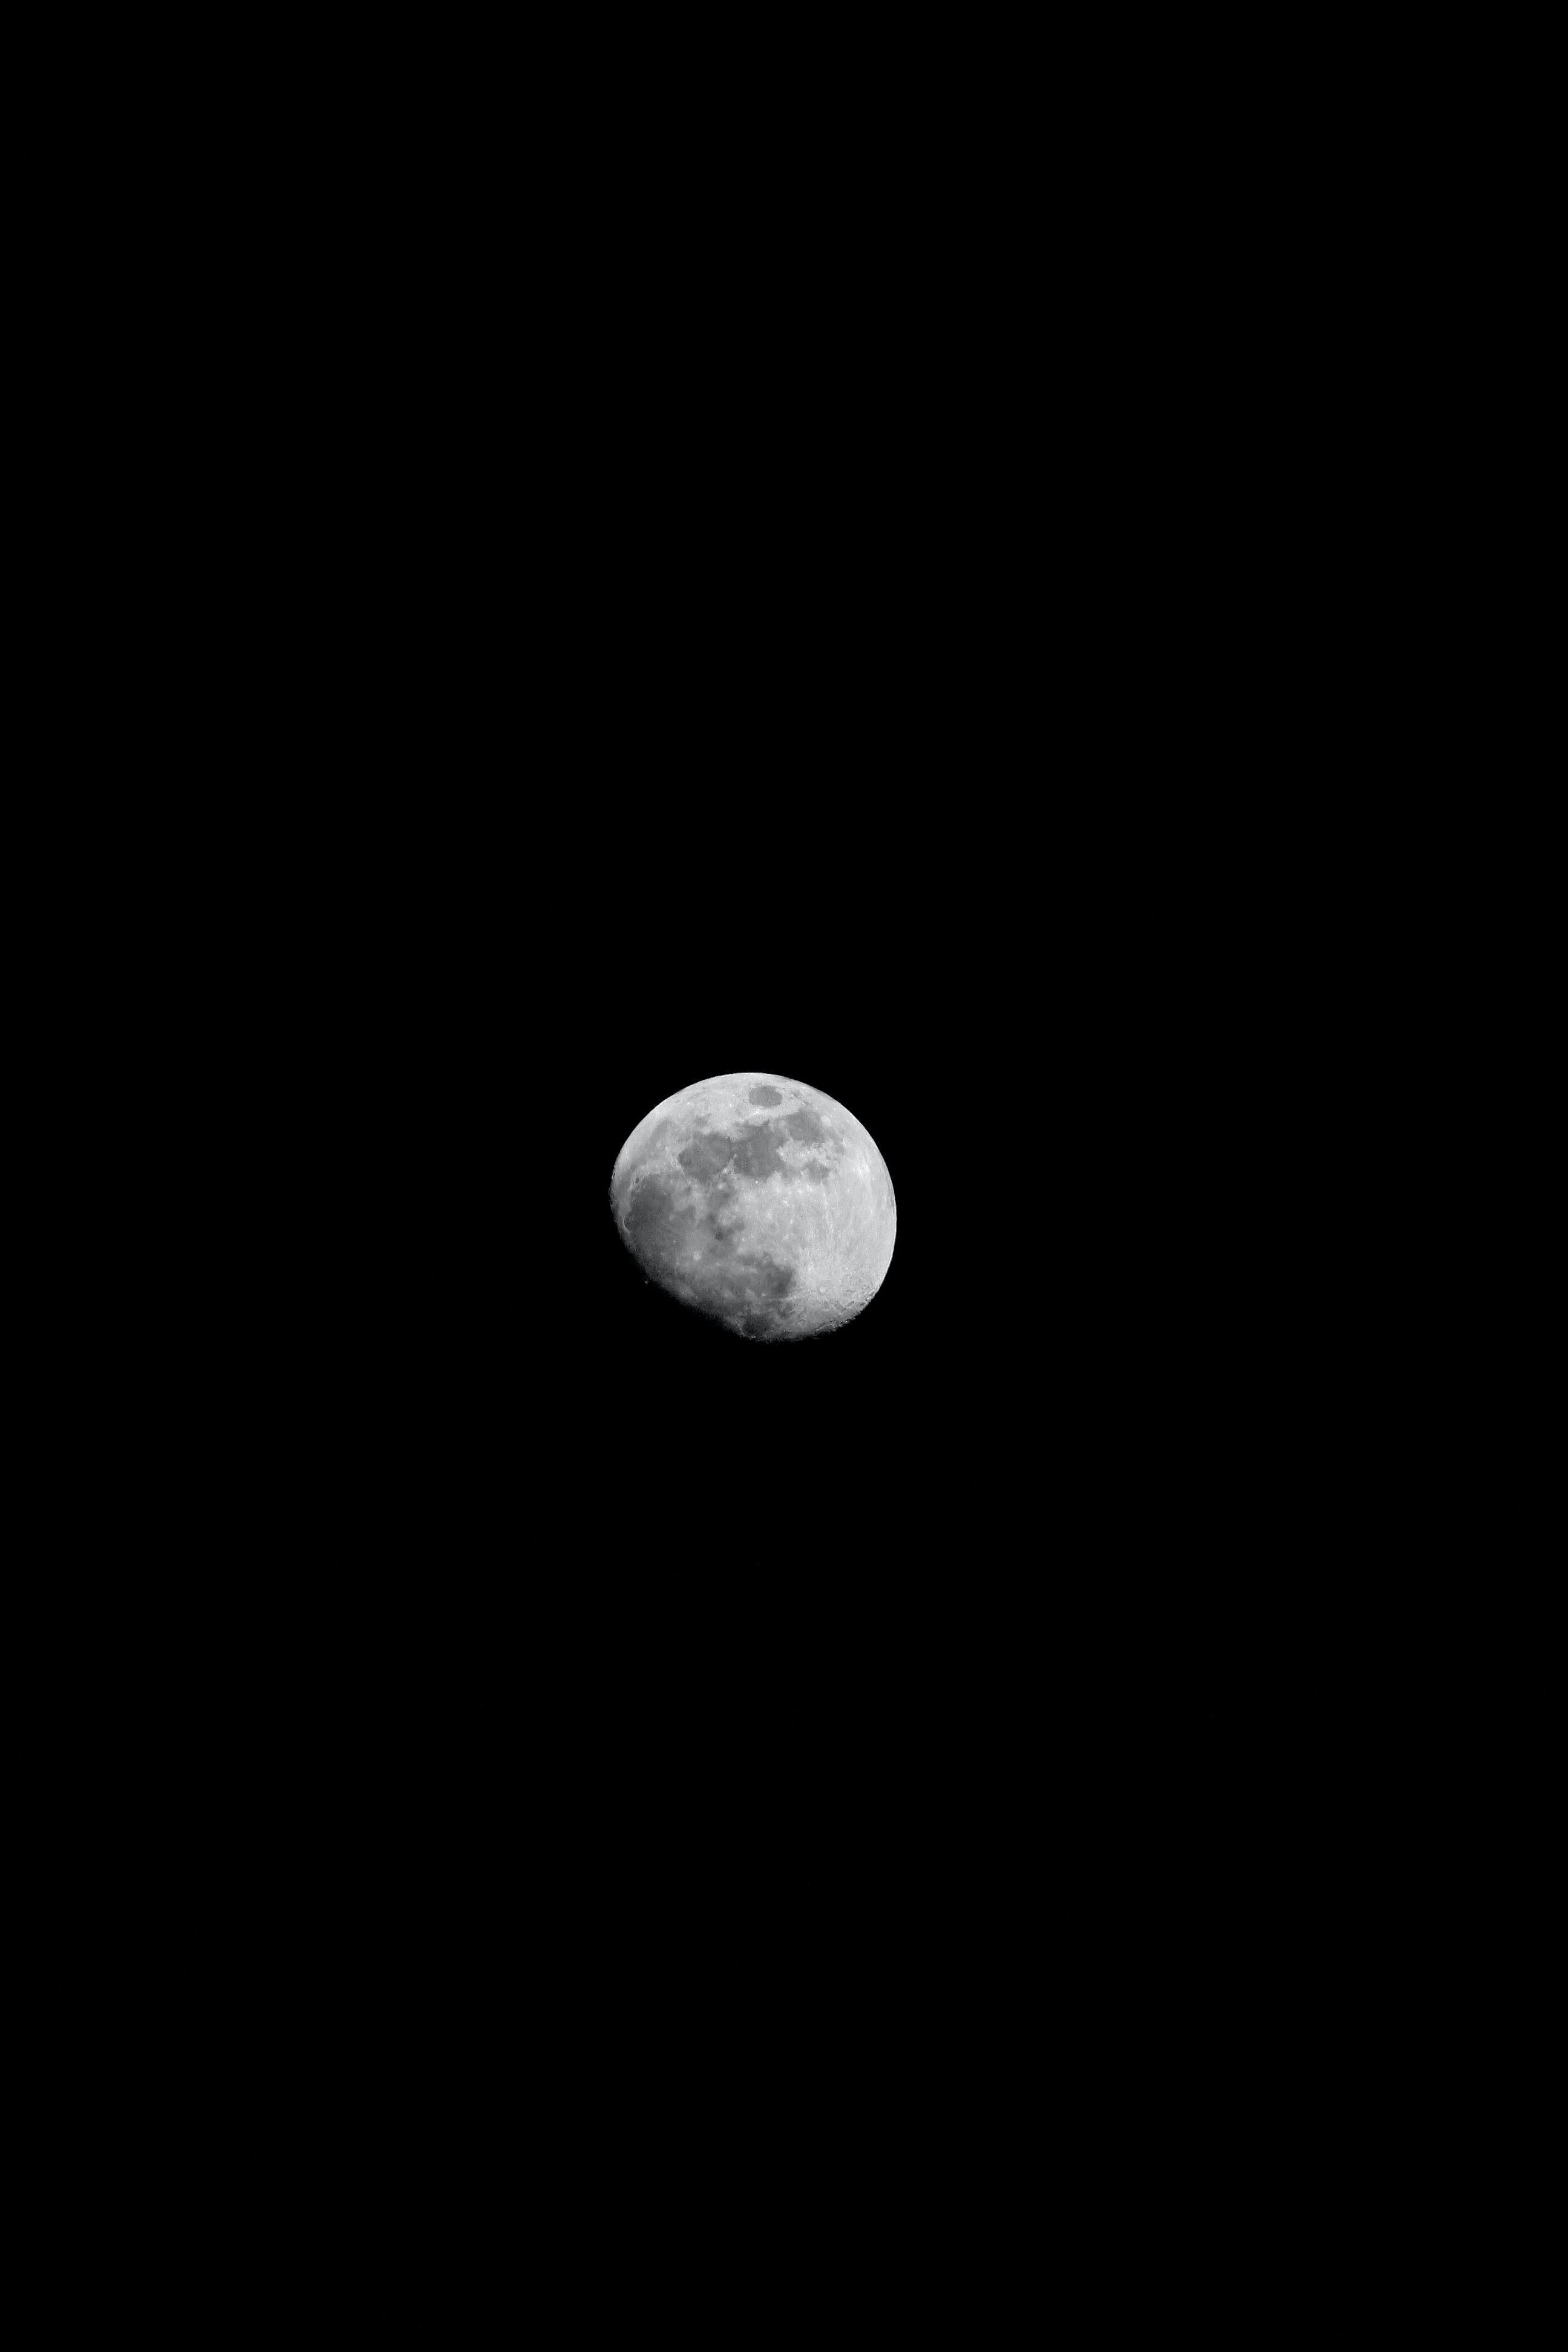 Hdの壁紙 夜 月の無料の写真素材